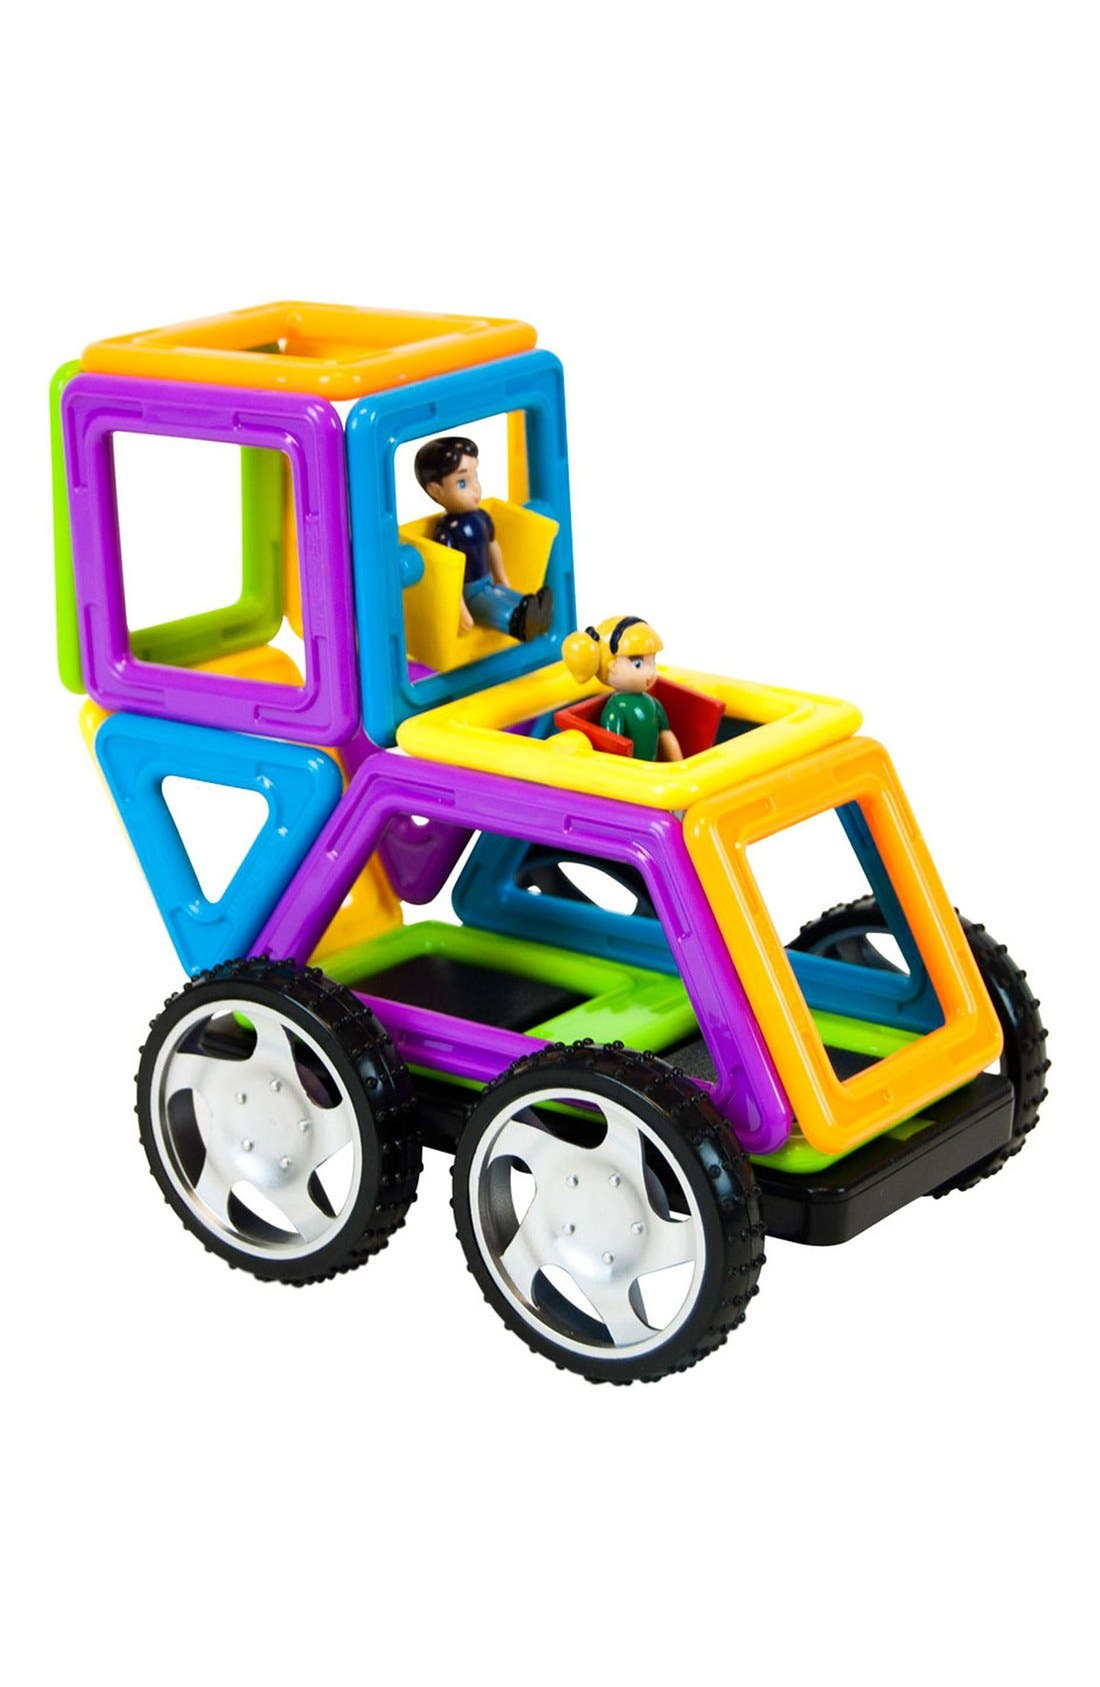 'Vehicle - WOW' Magnetic 3D Construction Set,                             Alternate thumbnail 5, color,                             Opaque Rainbow